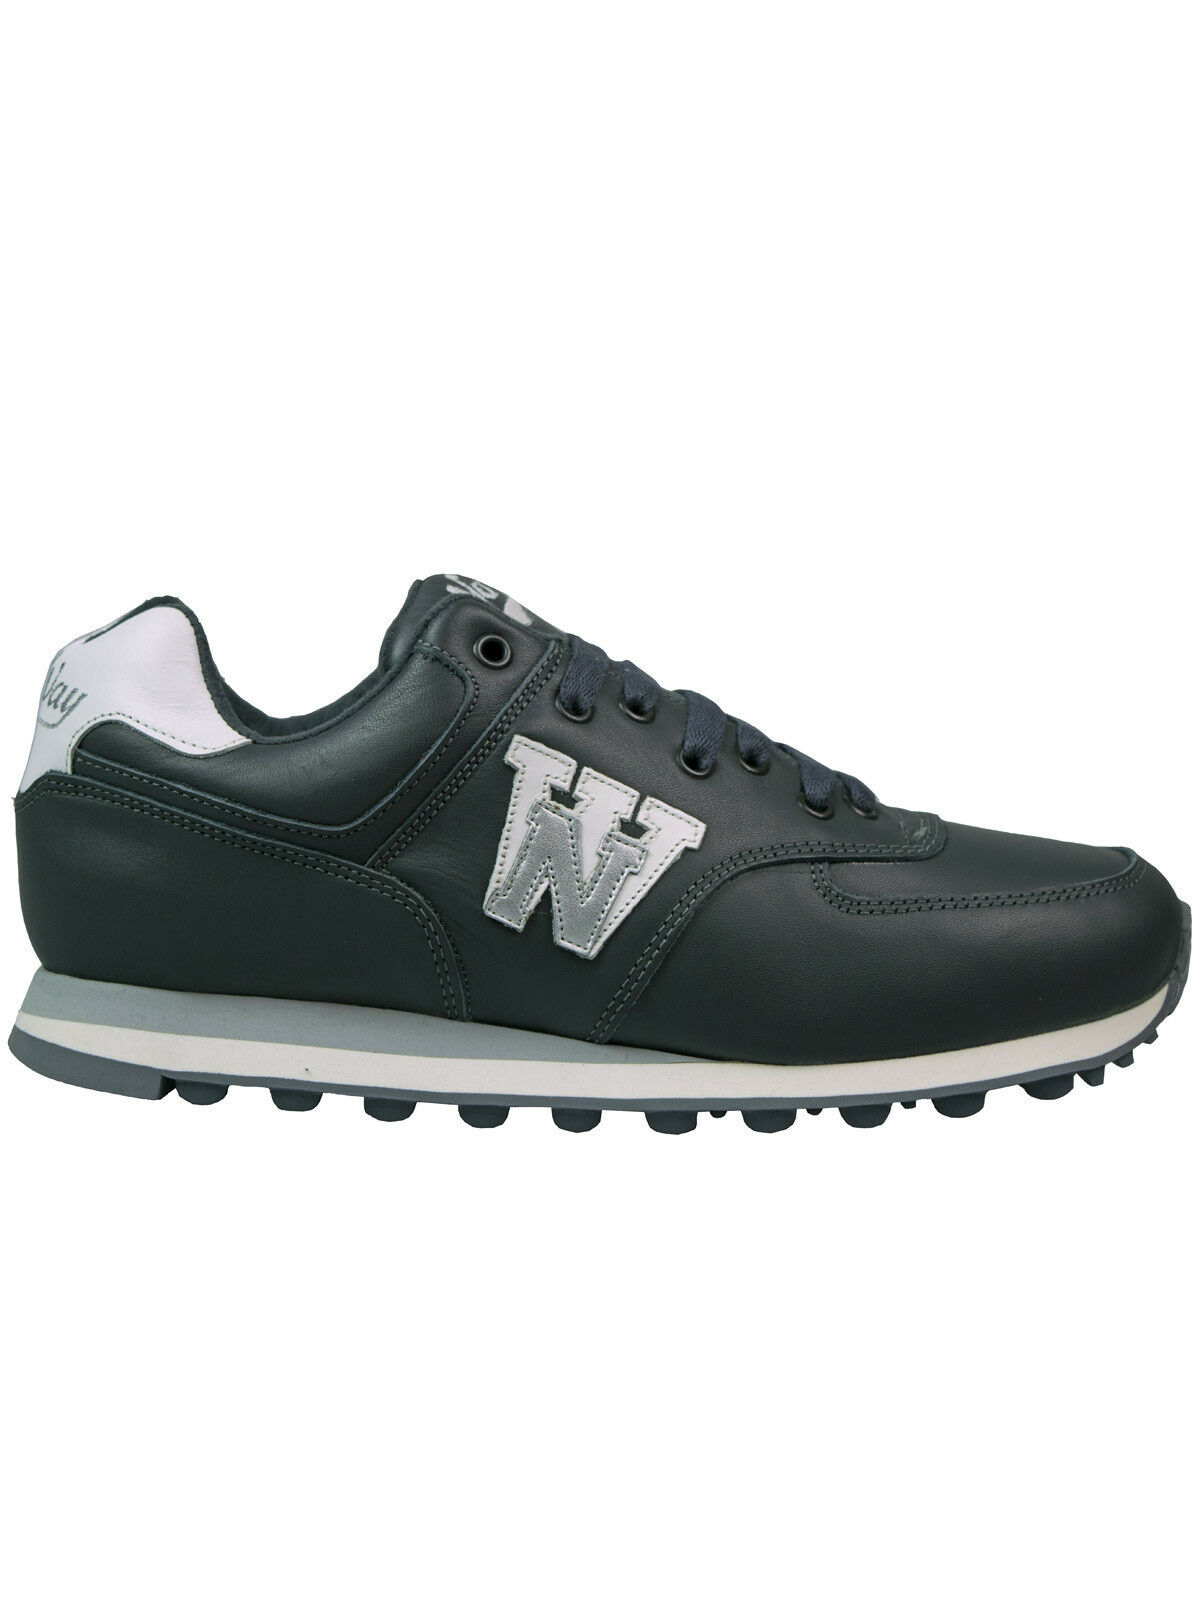 No Way Turnschuh   Sneaker   Schuh 3662 Glattleder grey   Grey Antrax  5003